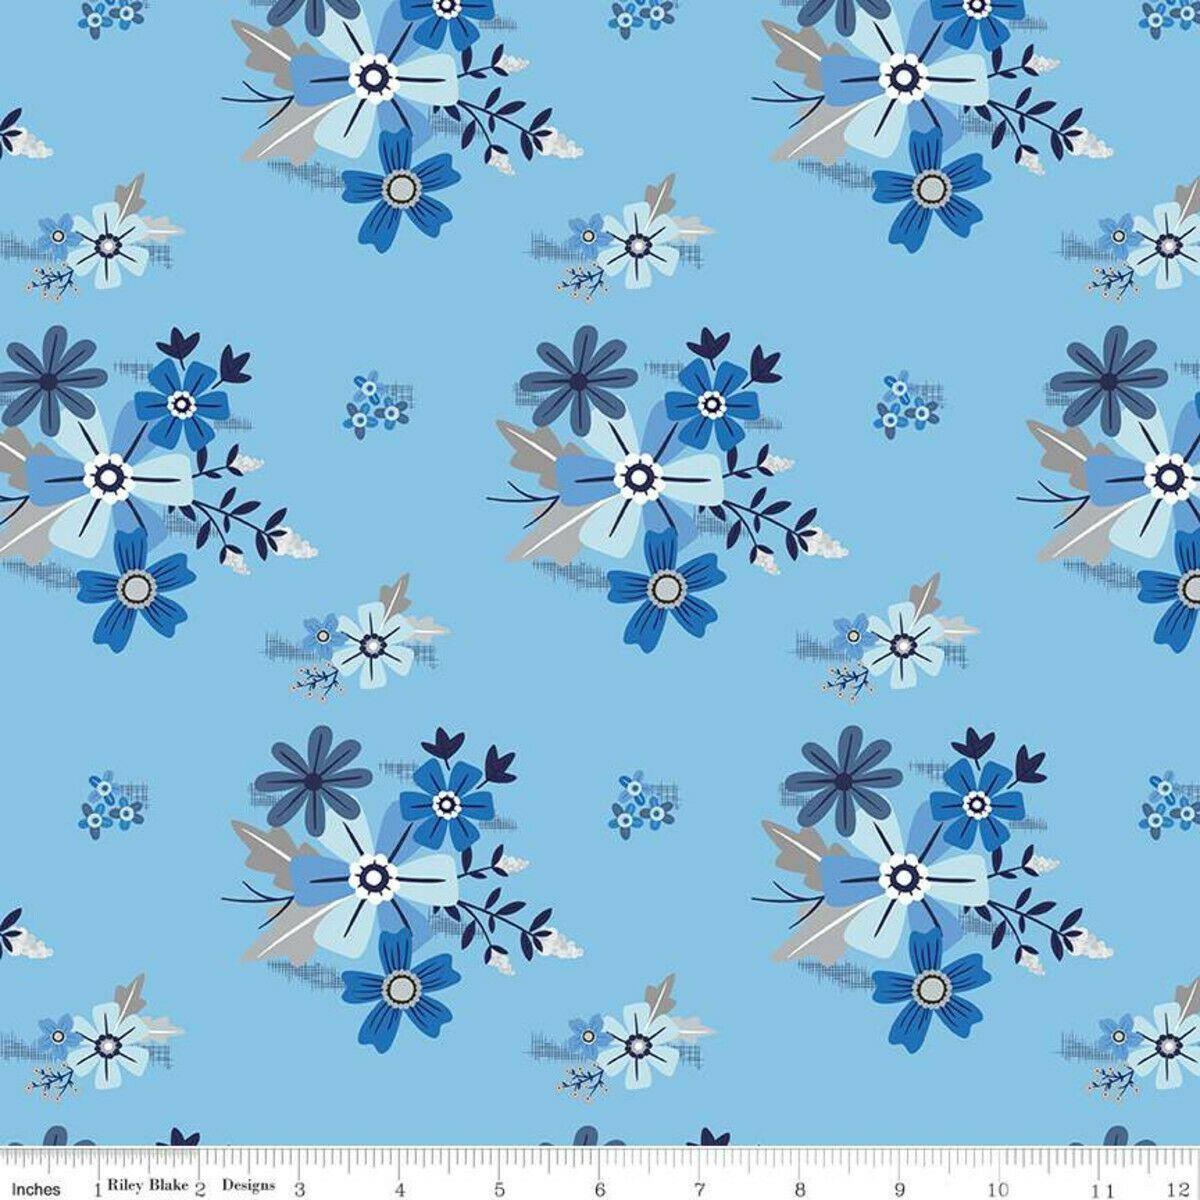 BLUE STITCH MAIN FABRIC SKY by Riley Blake